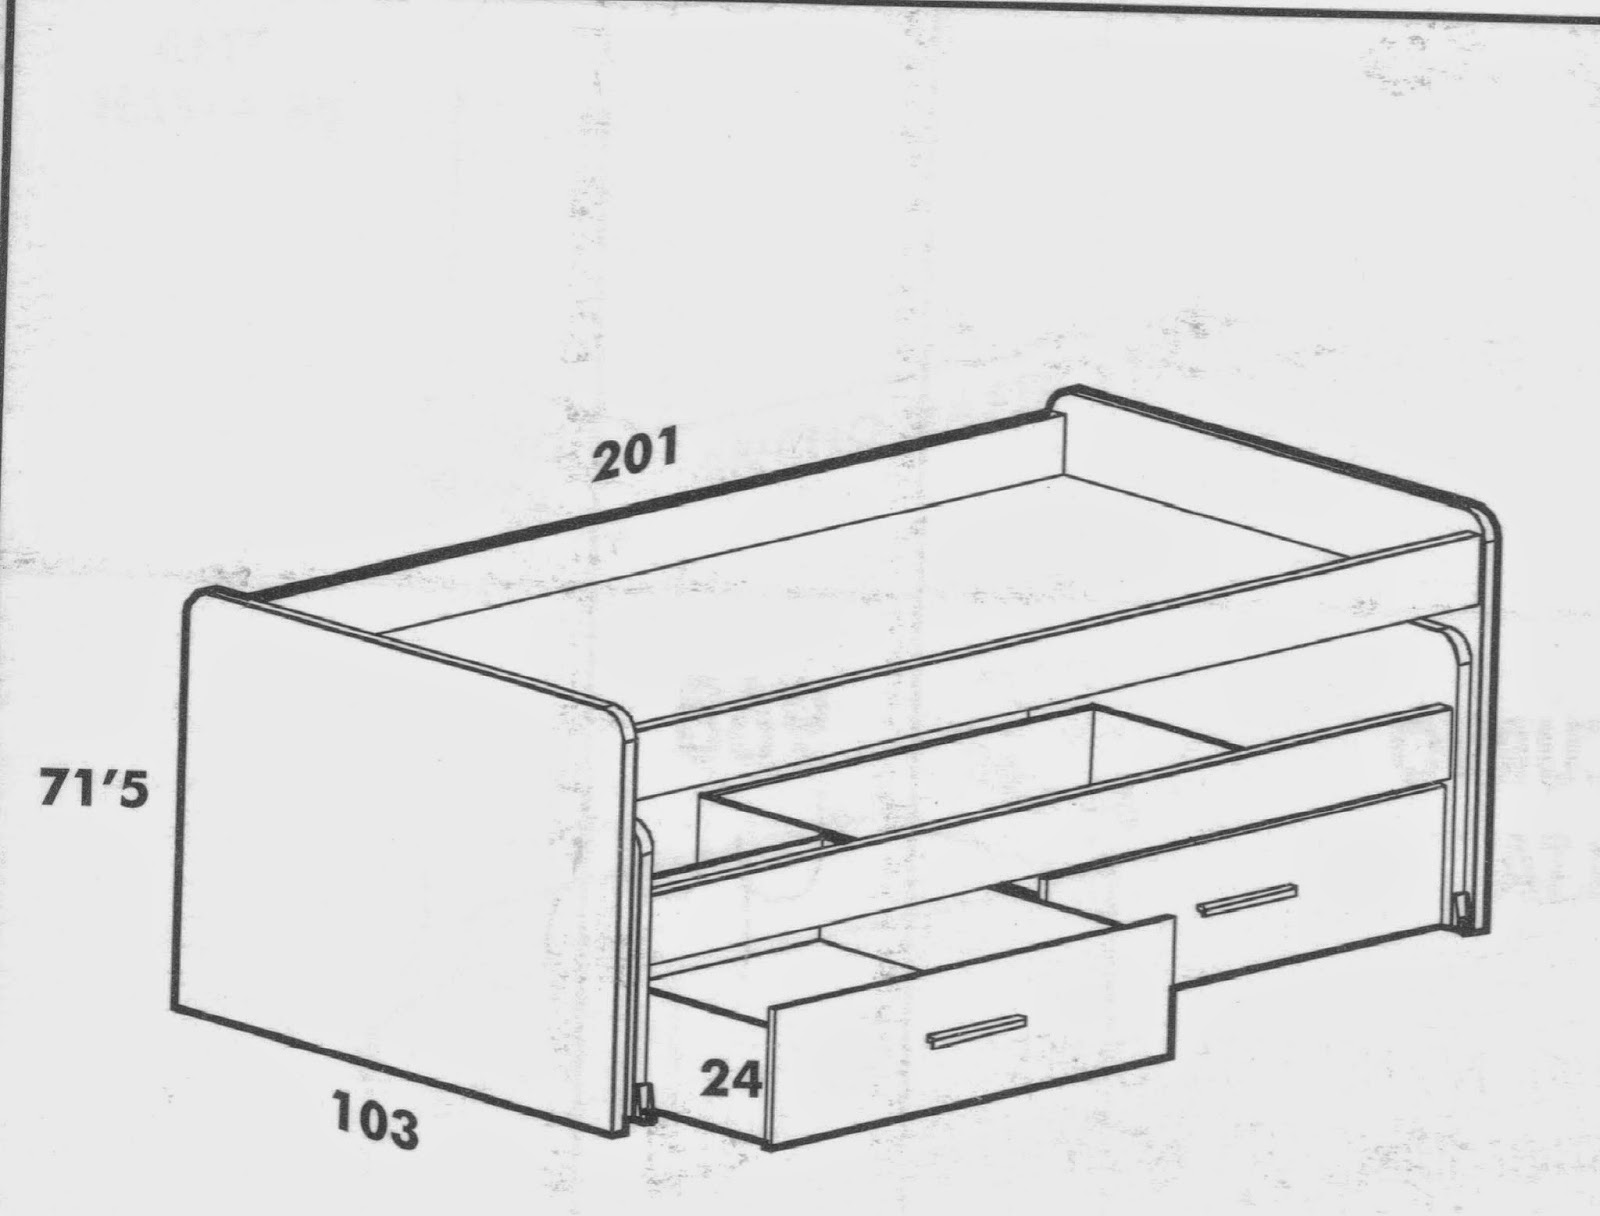 Tkautiva dormitorios juveniles i elegir una cama for Camas en altura juveniles